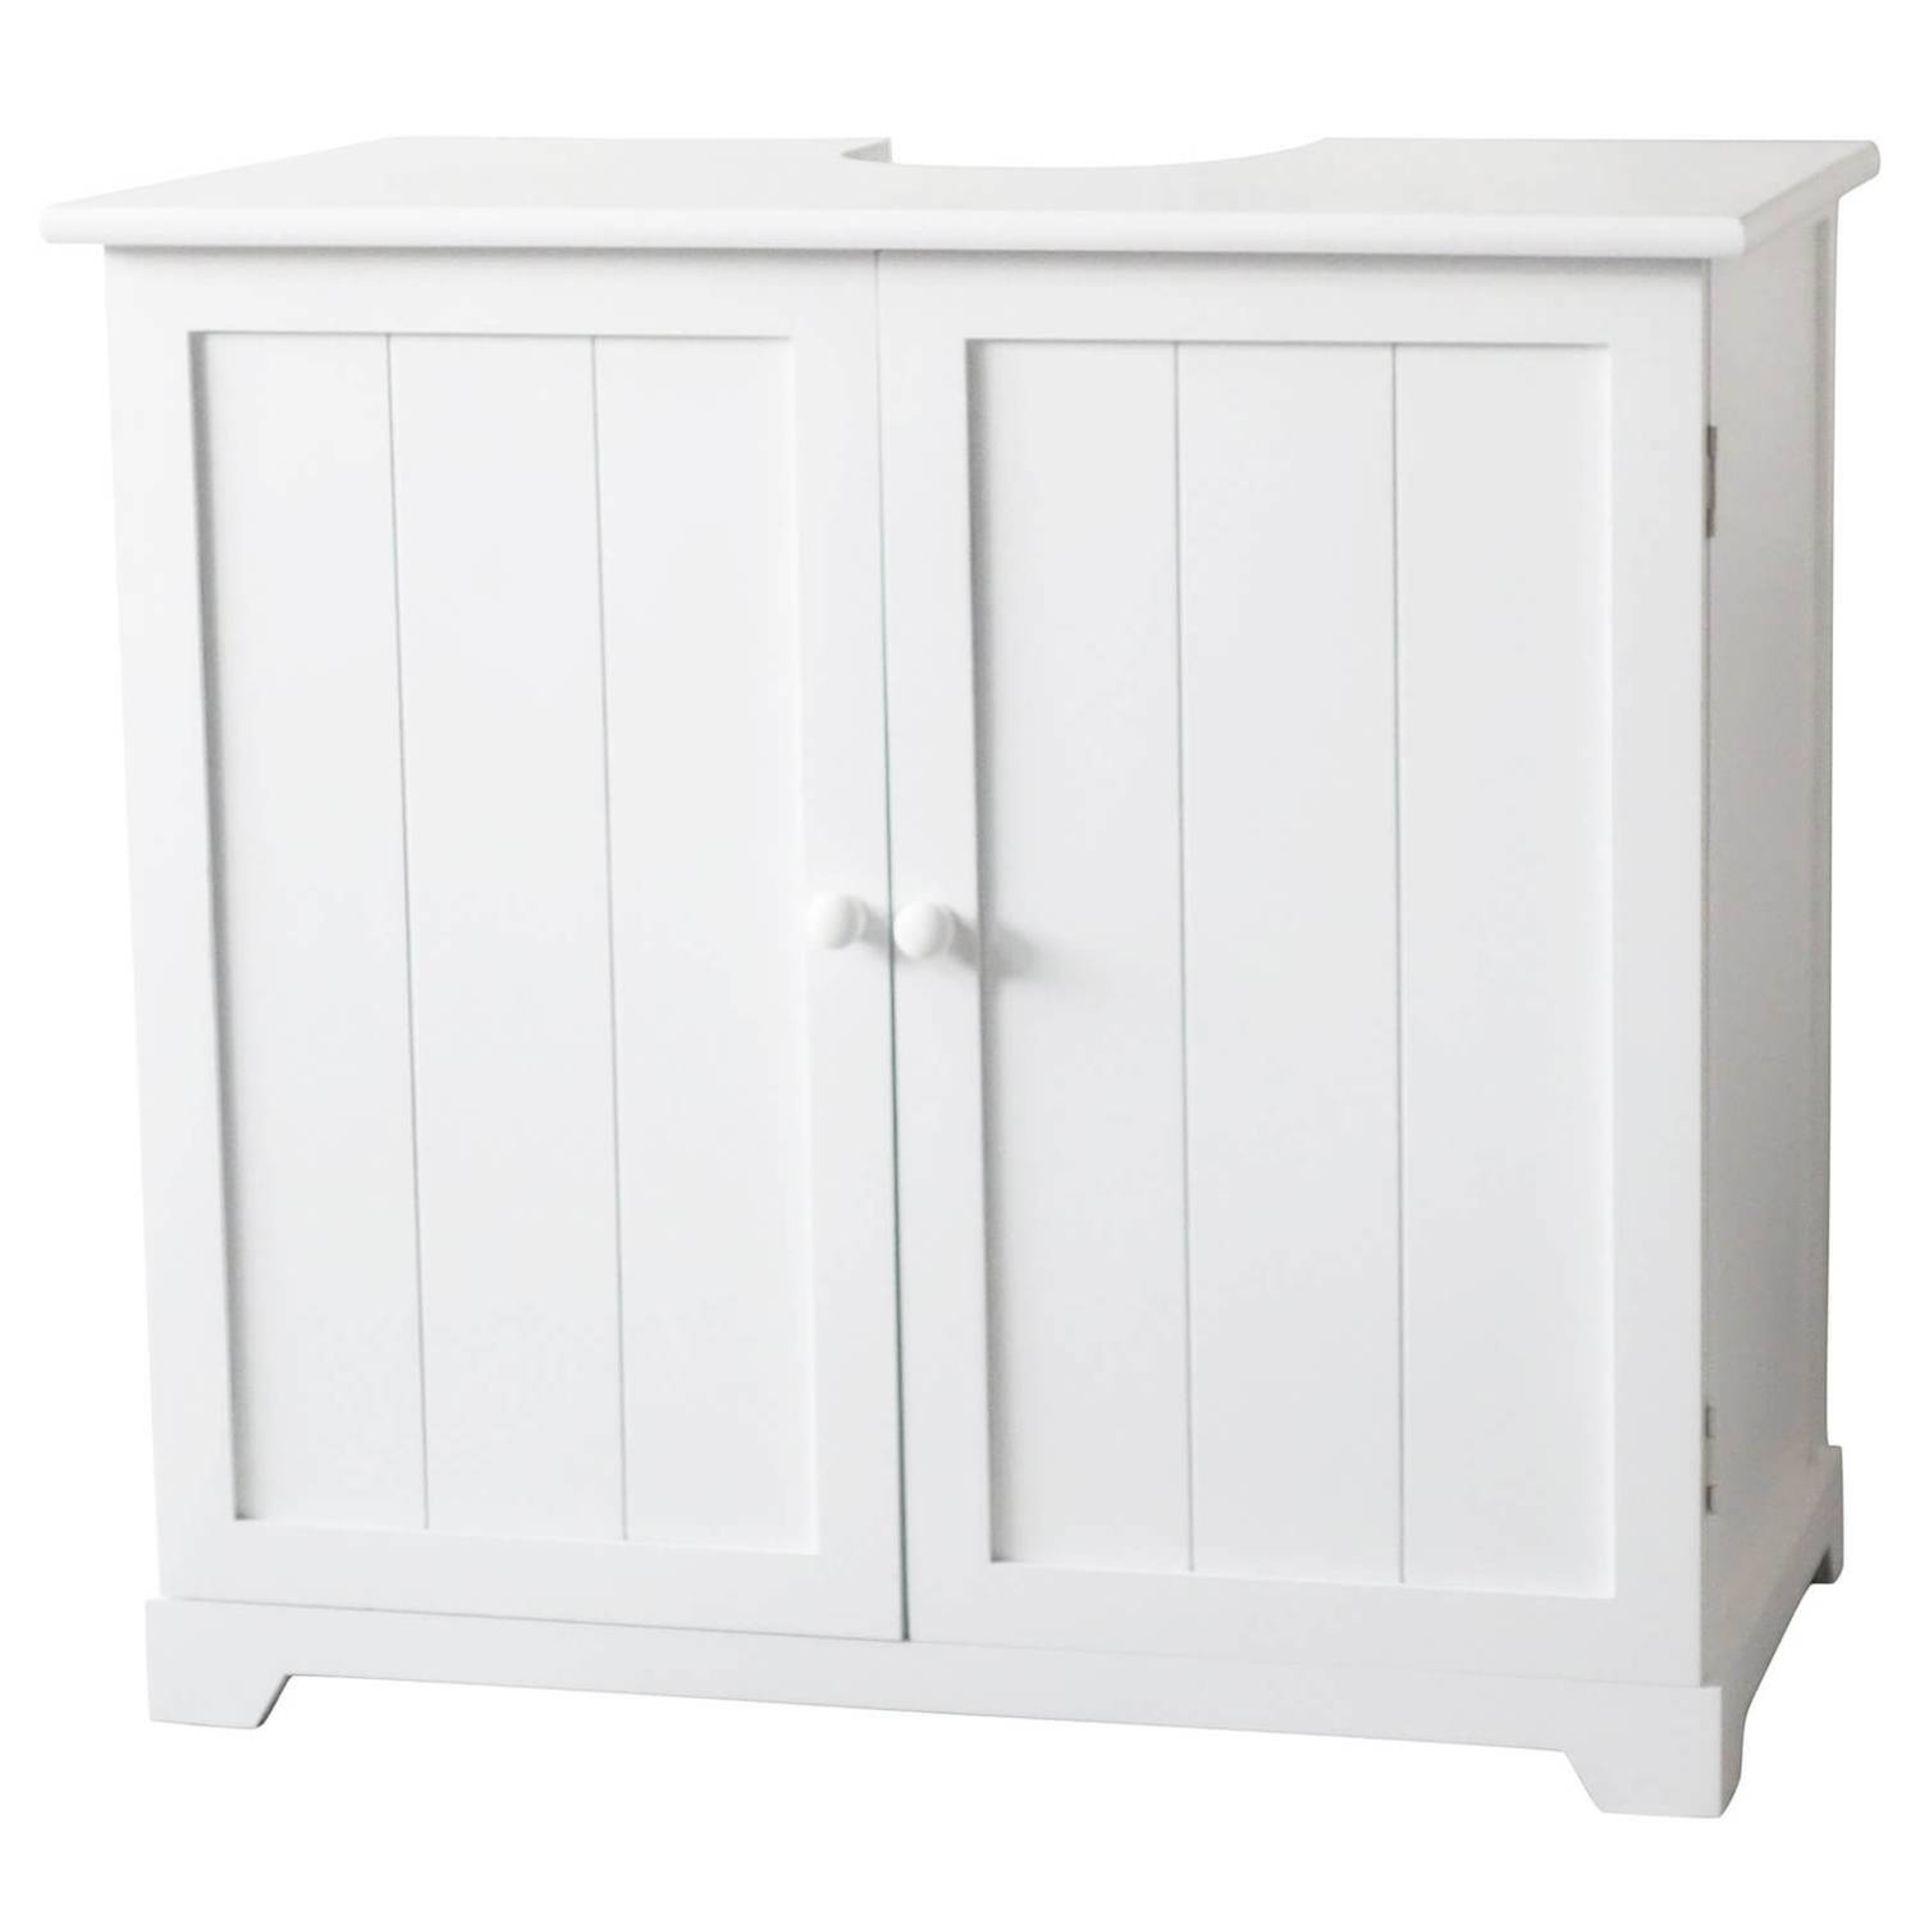 (P3) 1x White Classic Under Sink Double Unit. Paulownia Wood. White Painted Finish. 2 Doors, 1 Shel